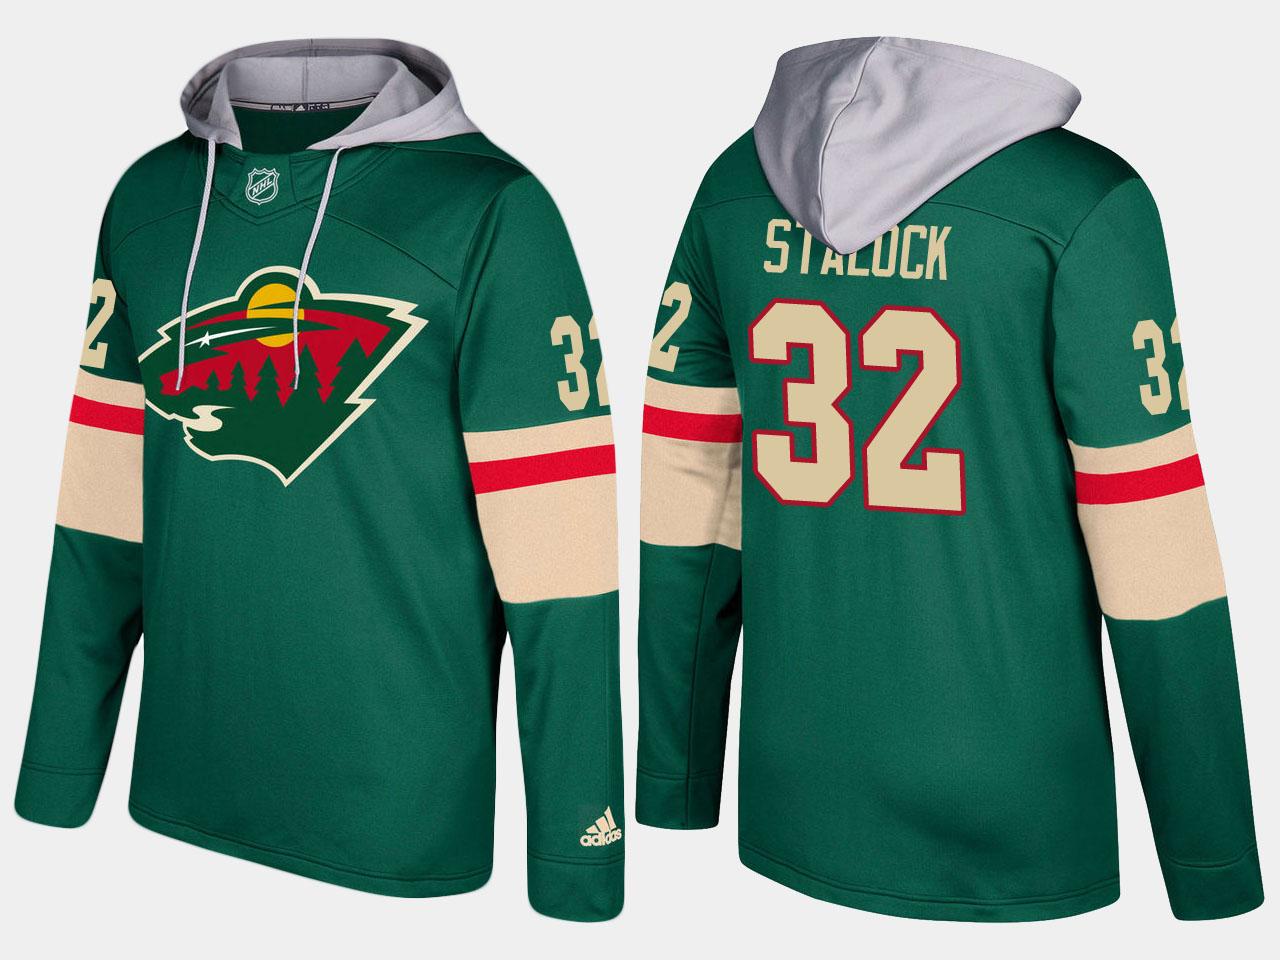 Nike Wild 32 Alex Stalock Name And Number Green Hoodie